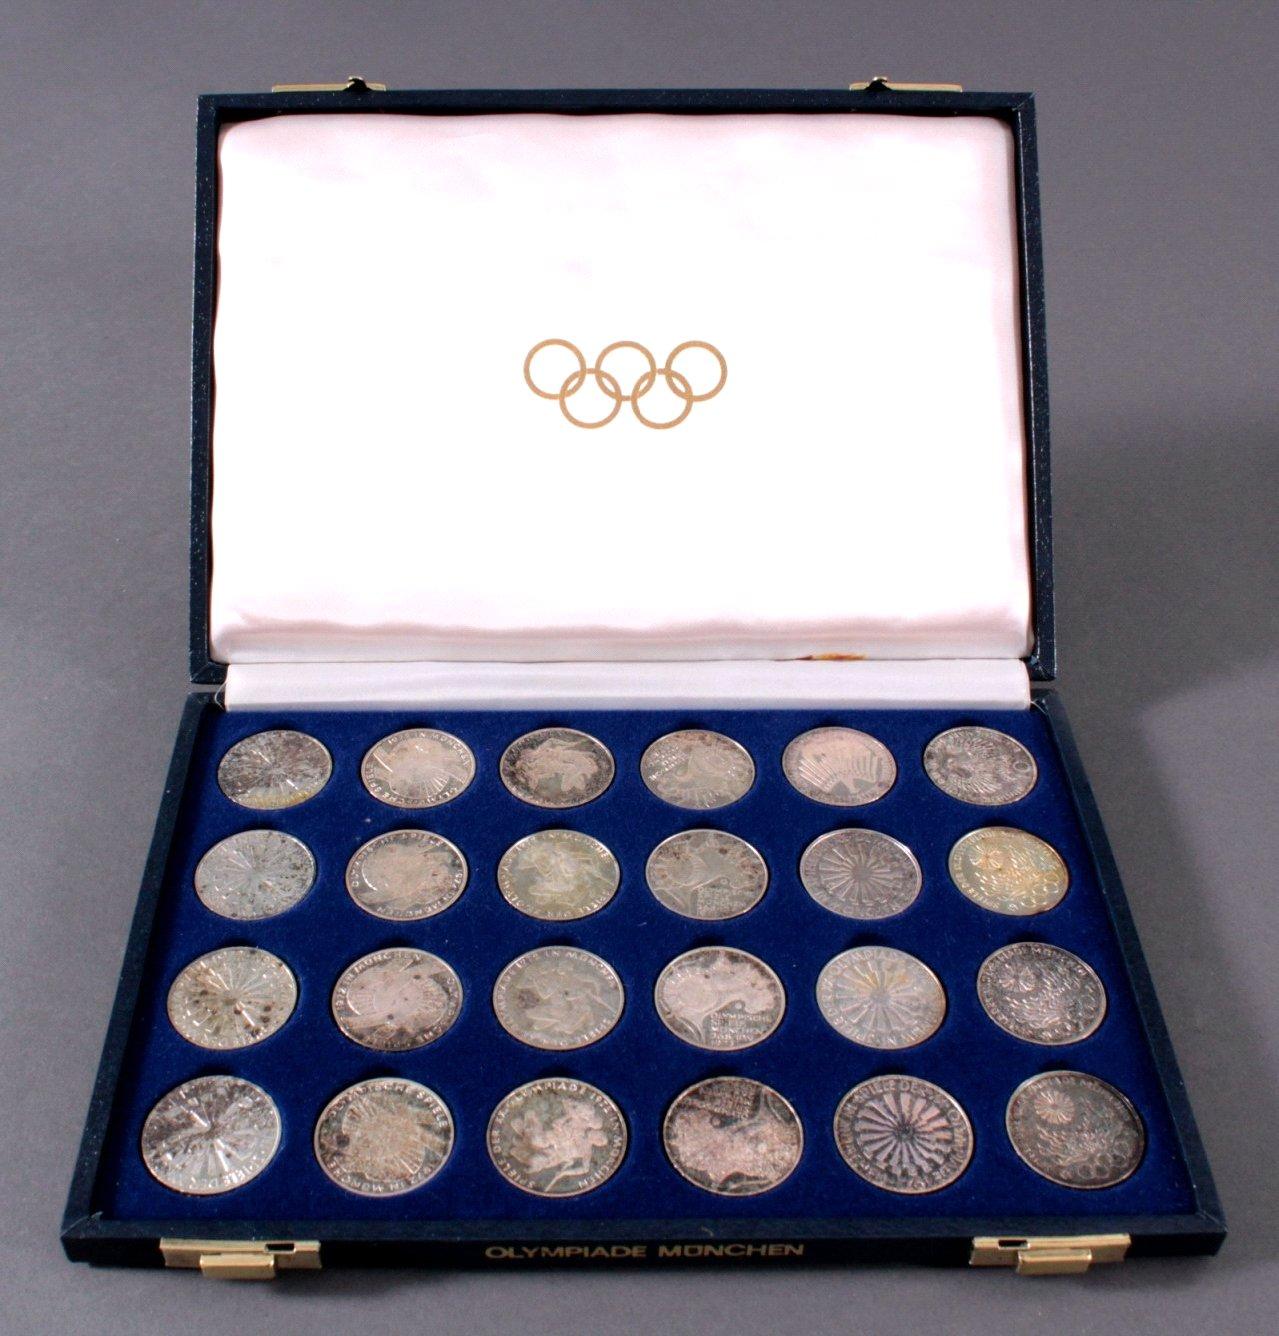 Olympiade München 1972, 10 DM Gedenkmünzen-2